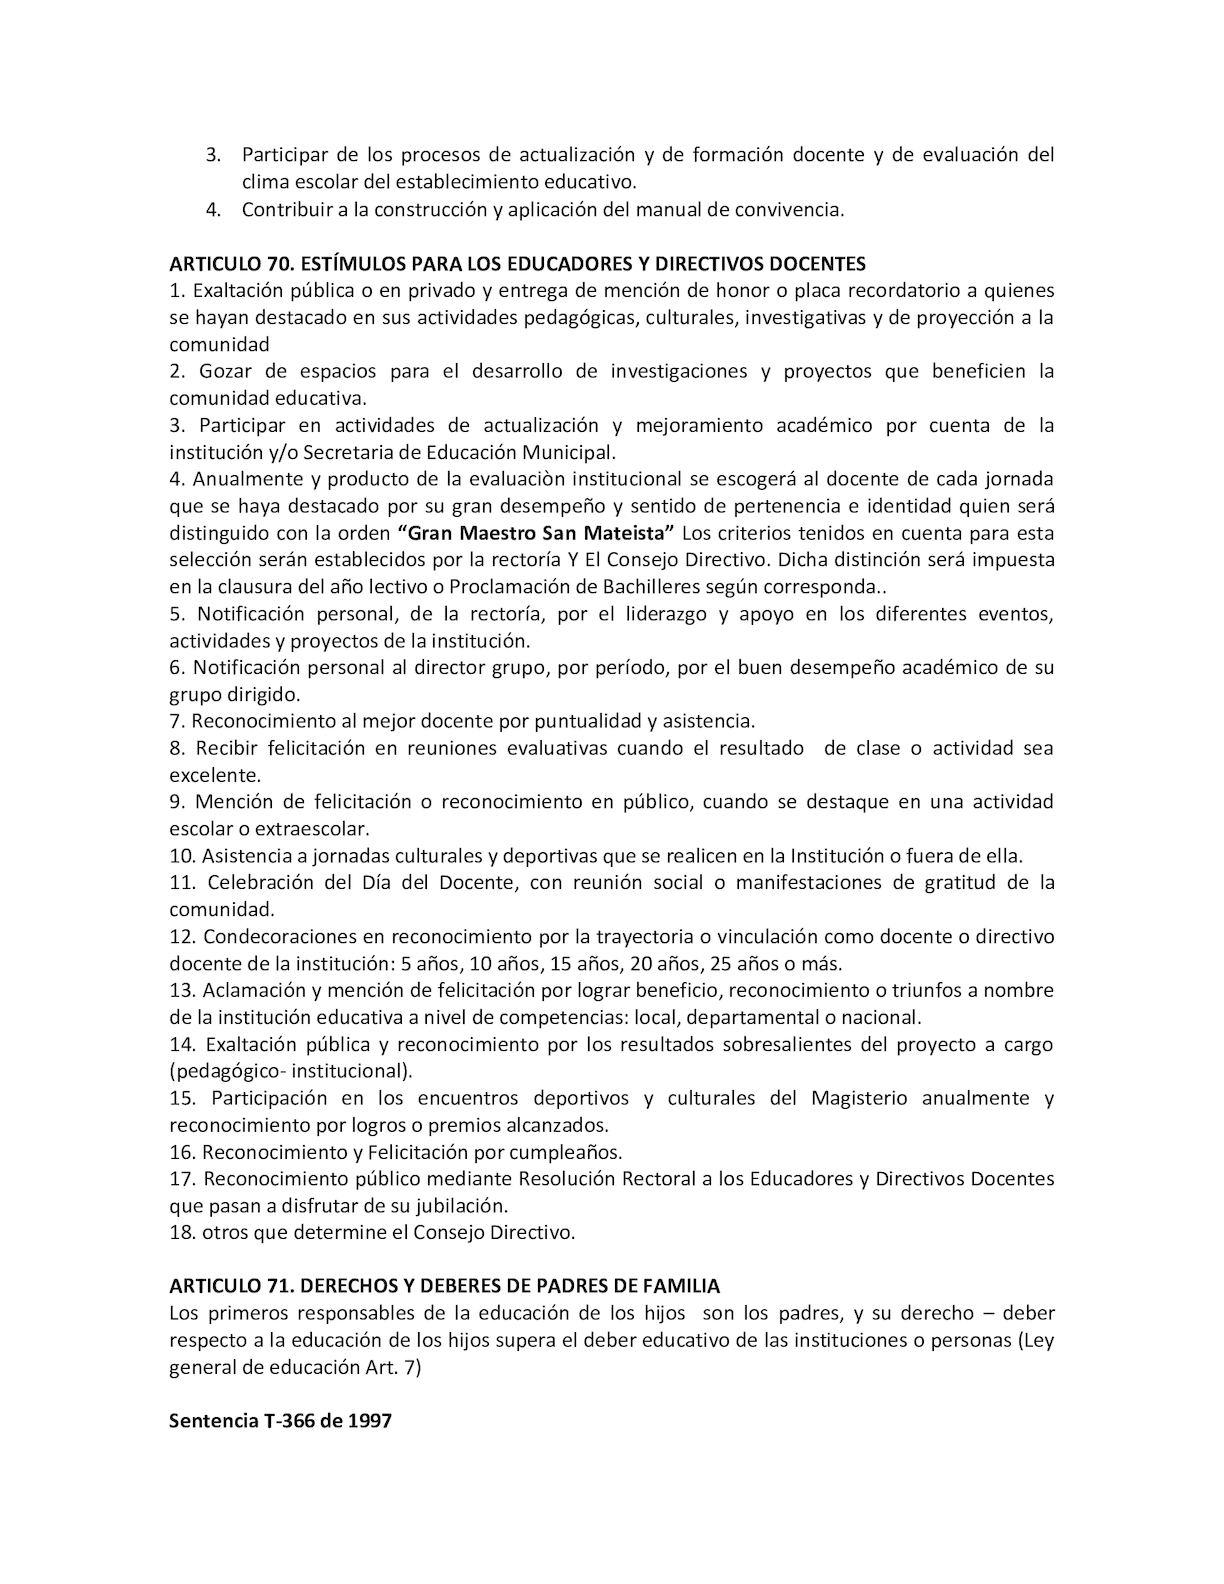 LEY 366 DE 1997 PDF